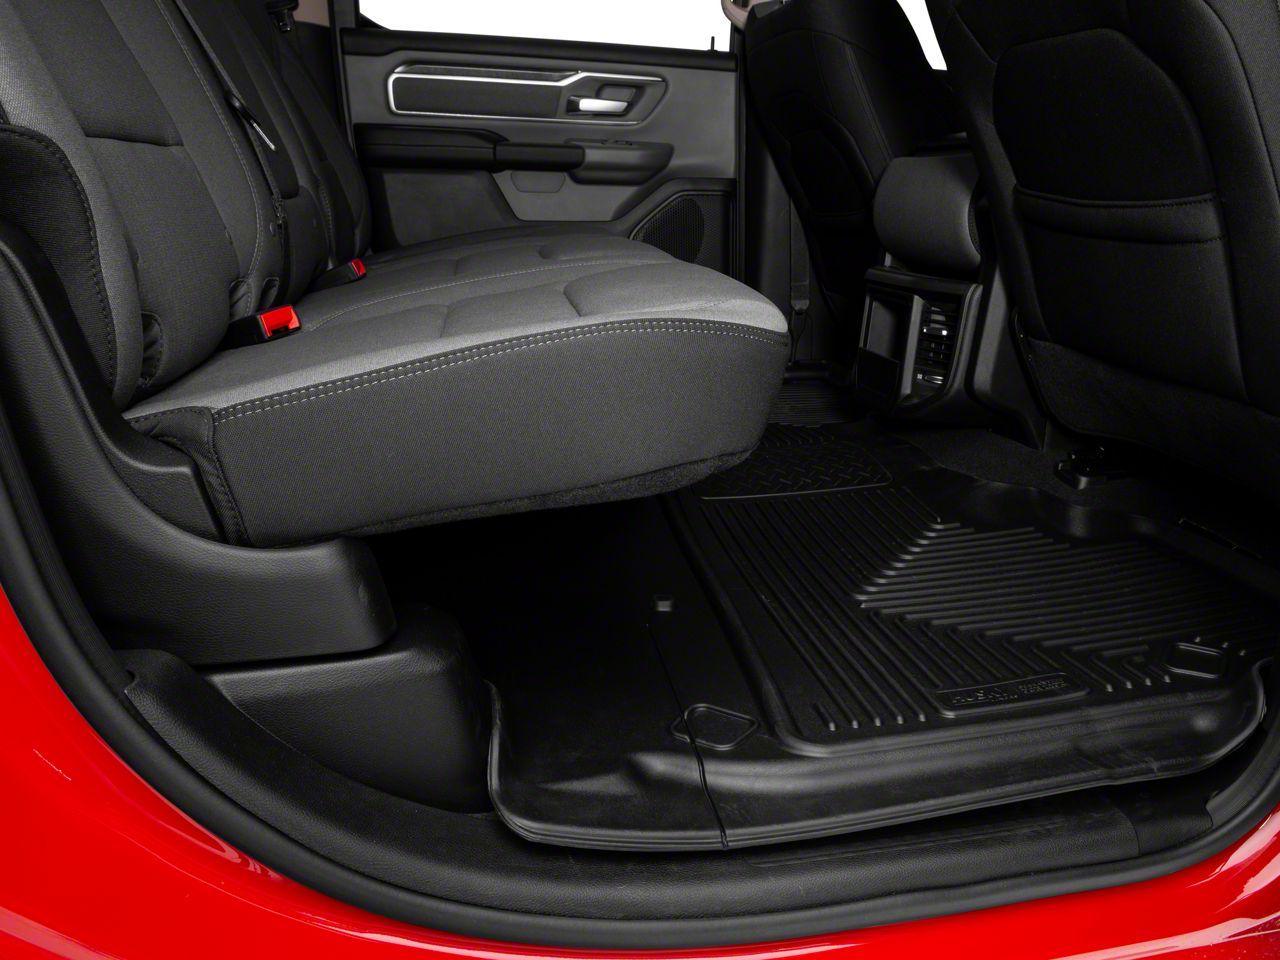 Husky WeatherBeater 2nd Seat Floor Mat - Black (2019 RAM 1500 Crew Cab w/o Factory Storage Box)